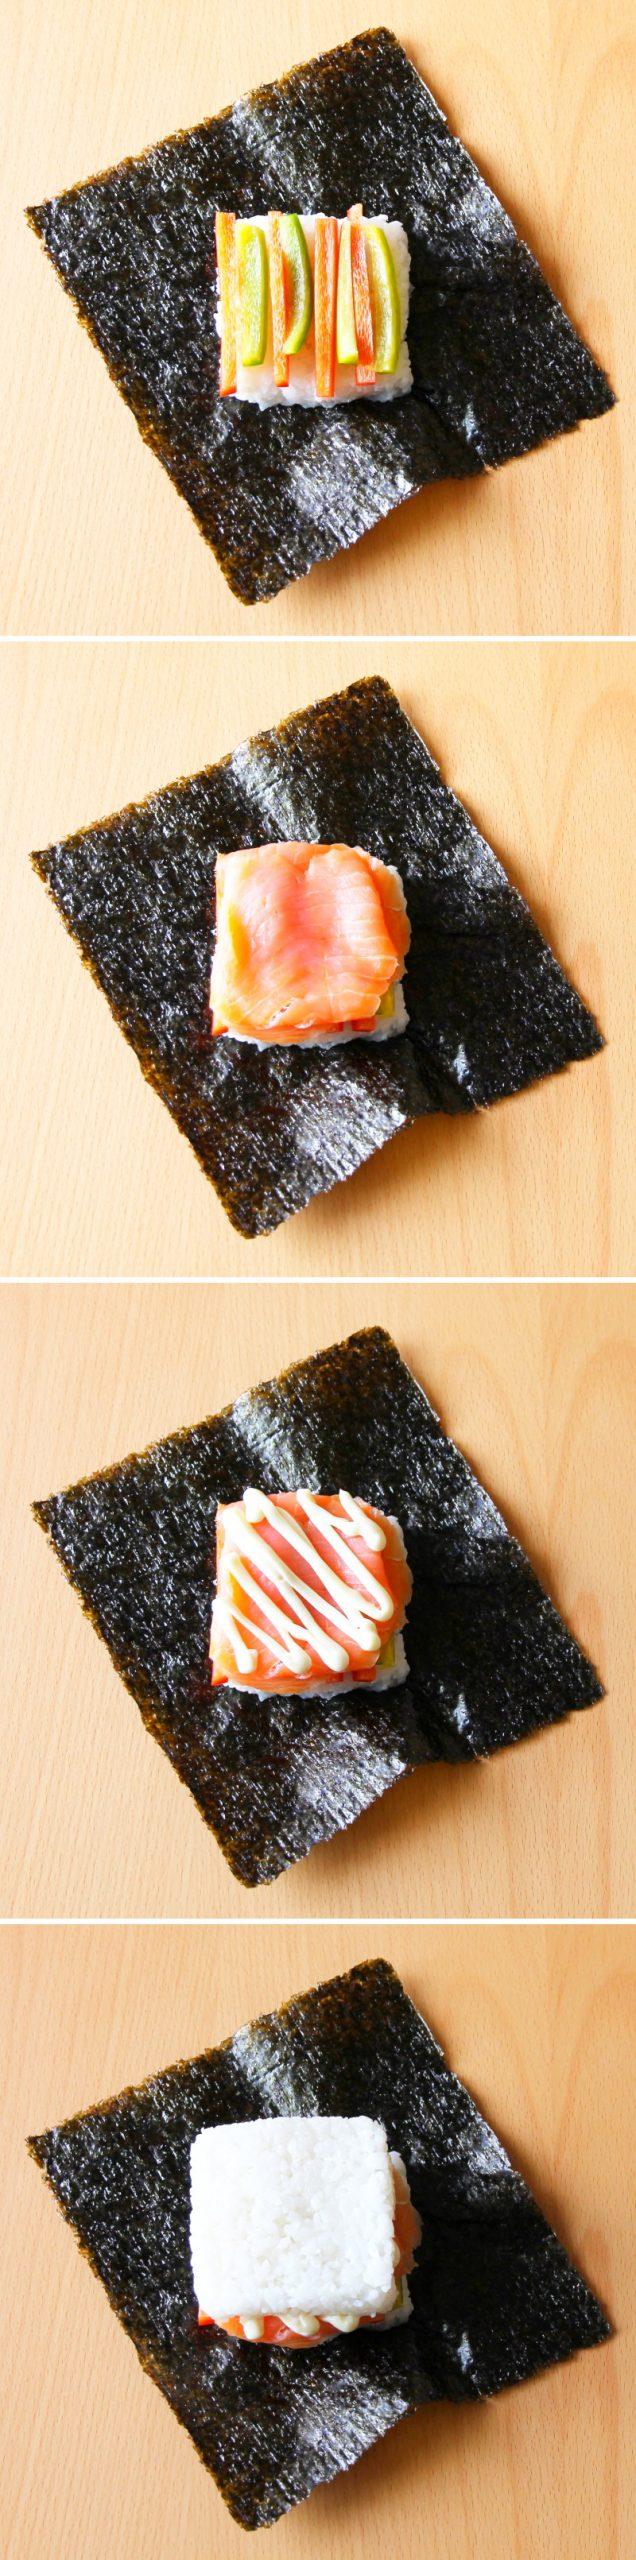 Onigirazu Sushi Sandwich Schritt 4 Füllung platzieren